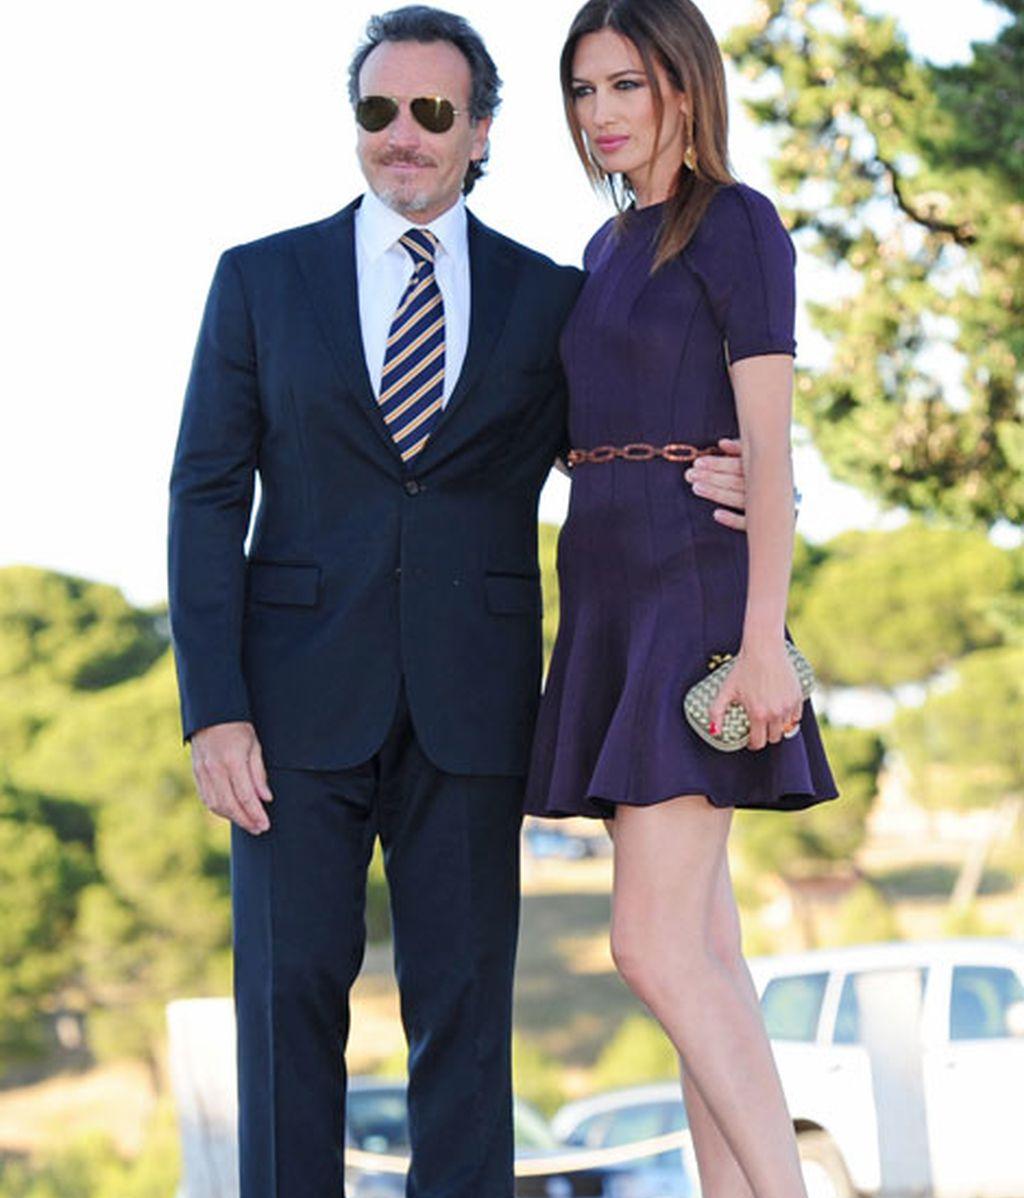 La modelo Nieves Álvarez y su marido, el fotógrafo Marco Severini